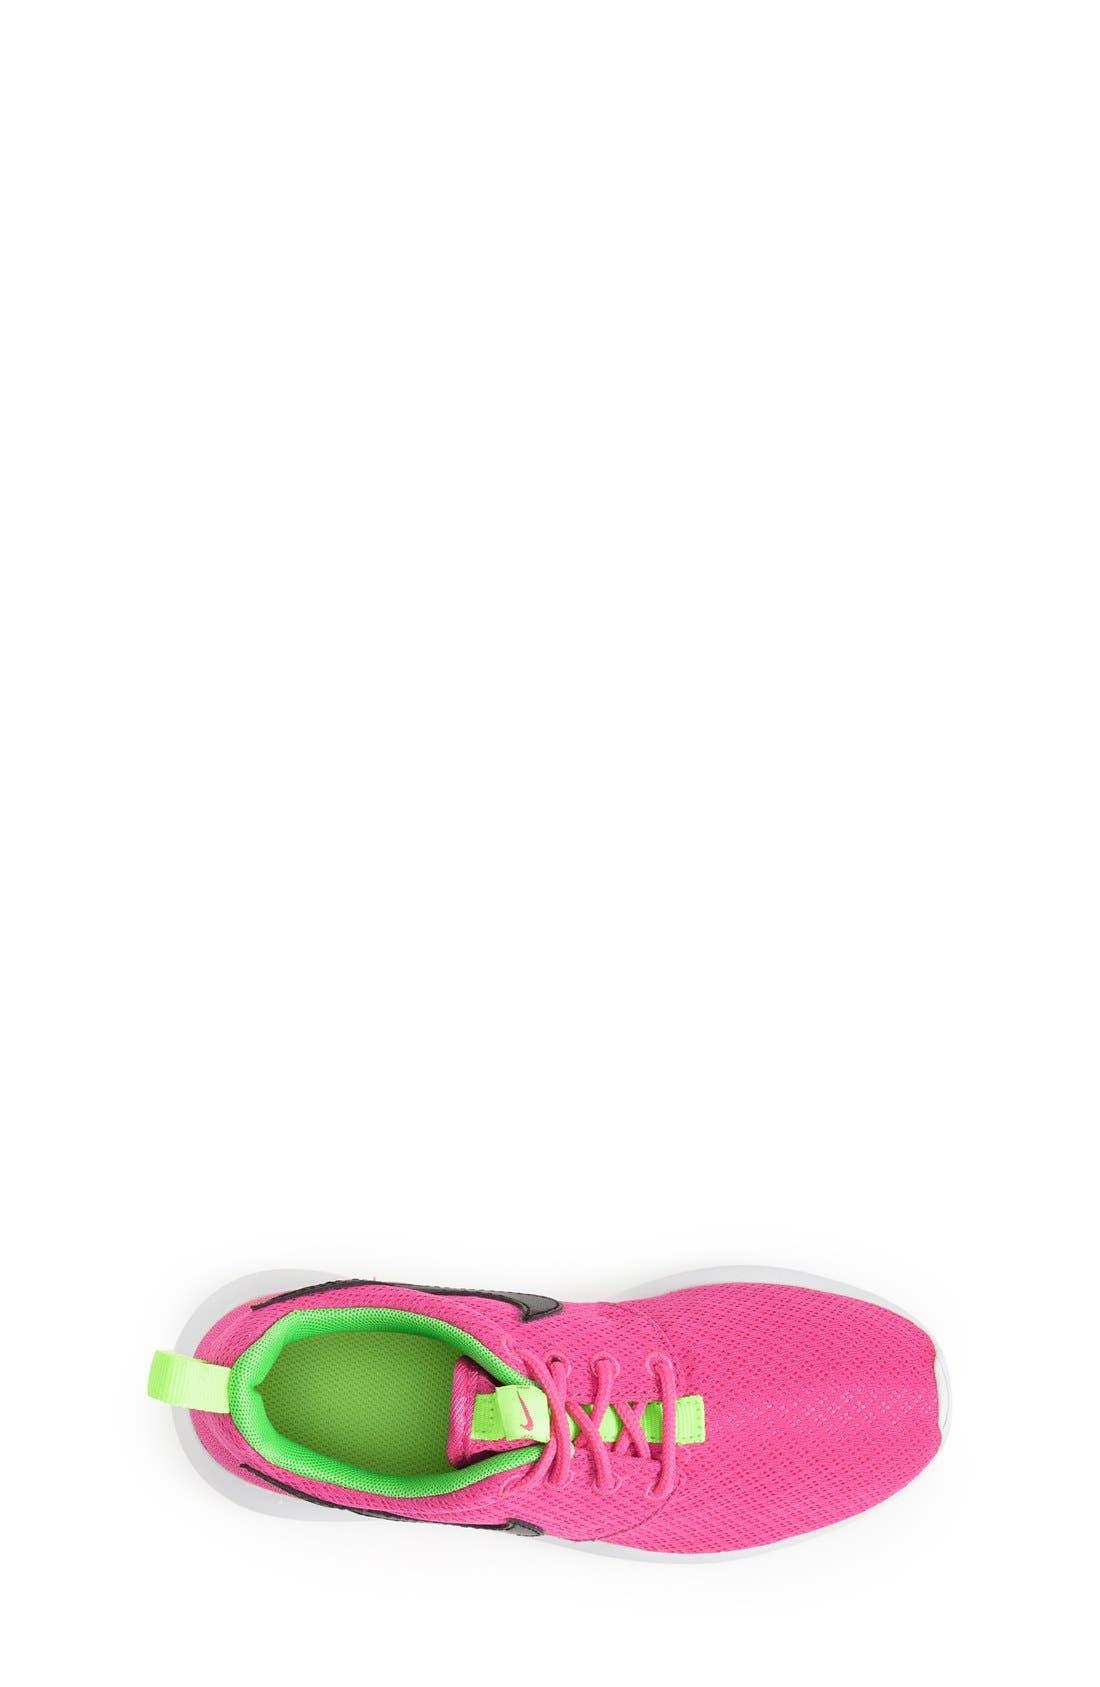 'Roshe Run' Athletic Shoe,                             Alternate thumbnail 178, color,